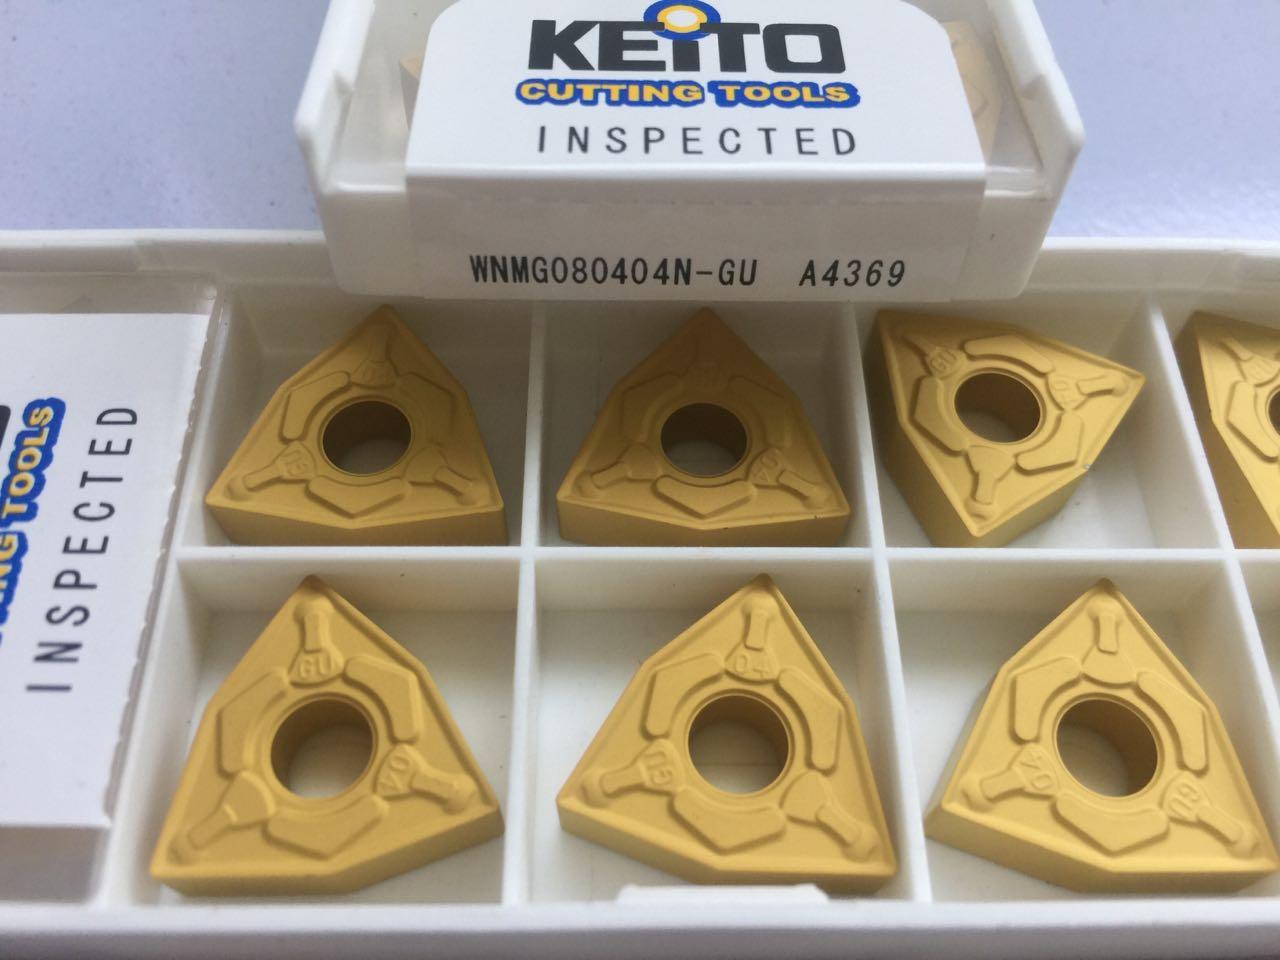 Carbide inserts WNMG080404N-GU